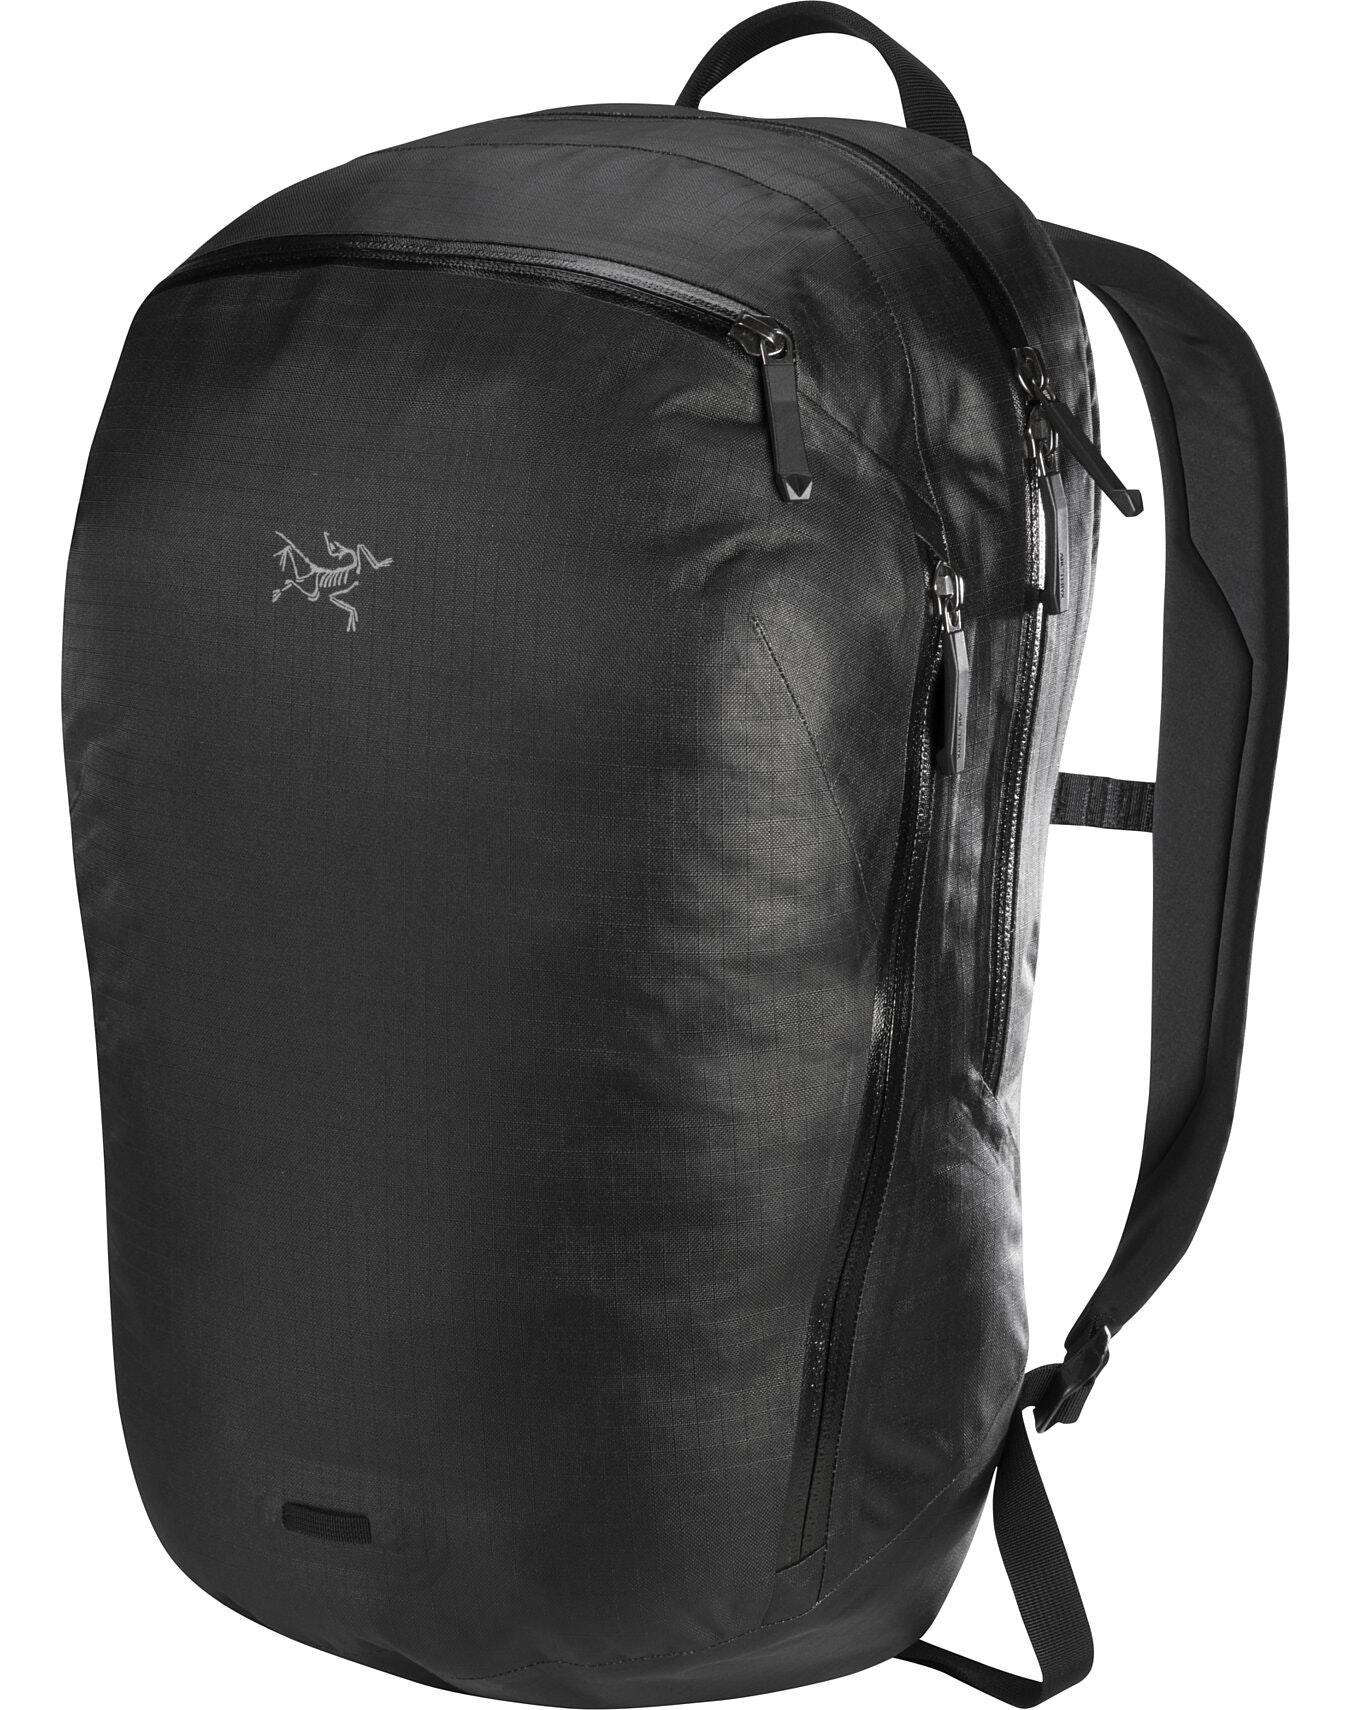 Granville 16 Zip Backpack Black